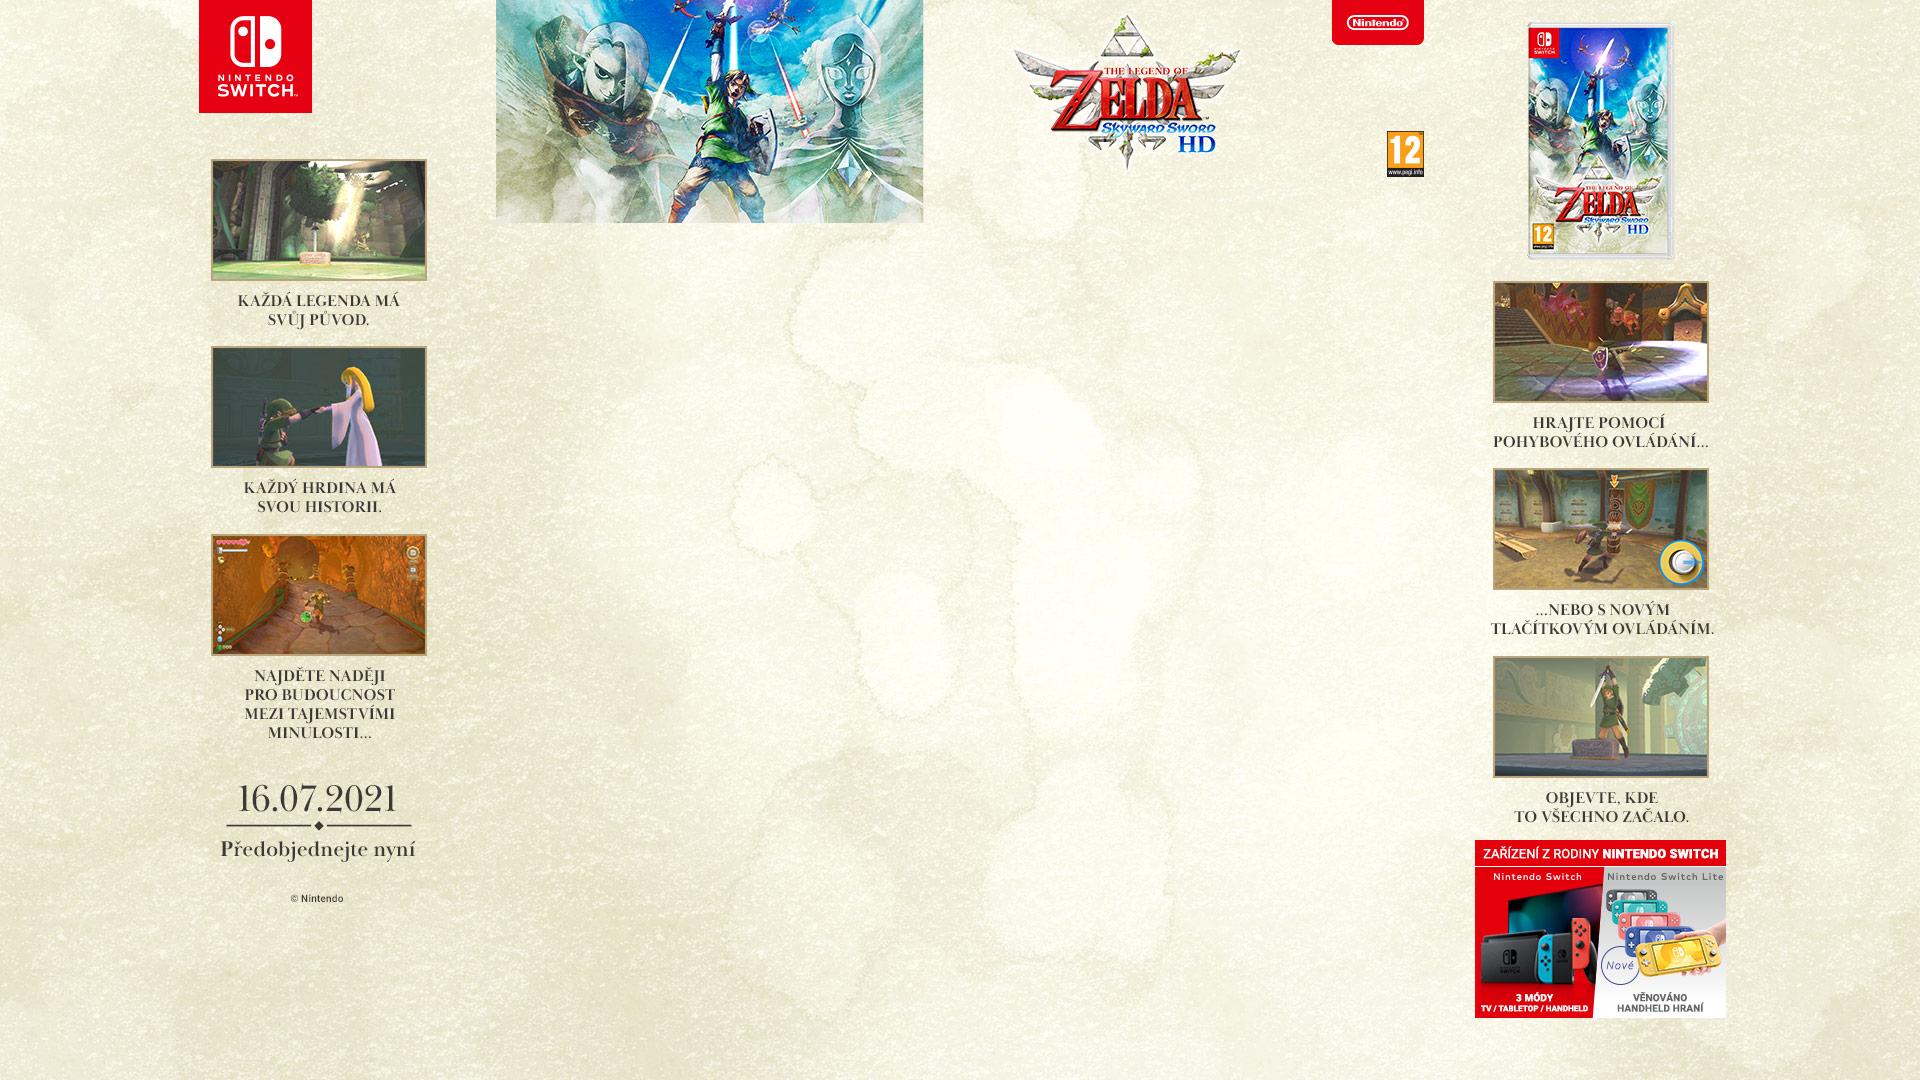 NINTENDOSHOP SWITCH The Legend of Zelda: Skyward Sword HD